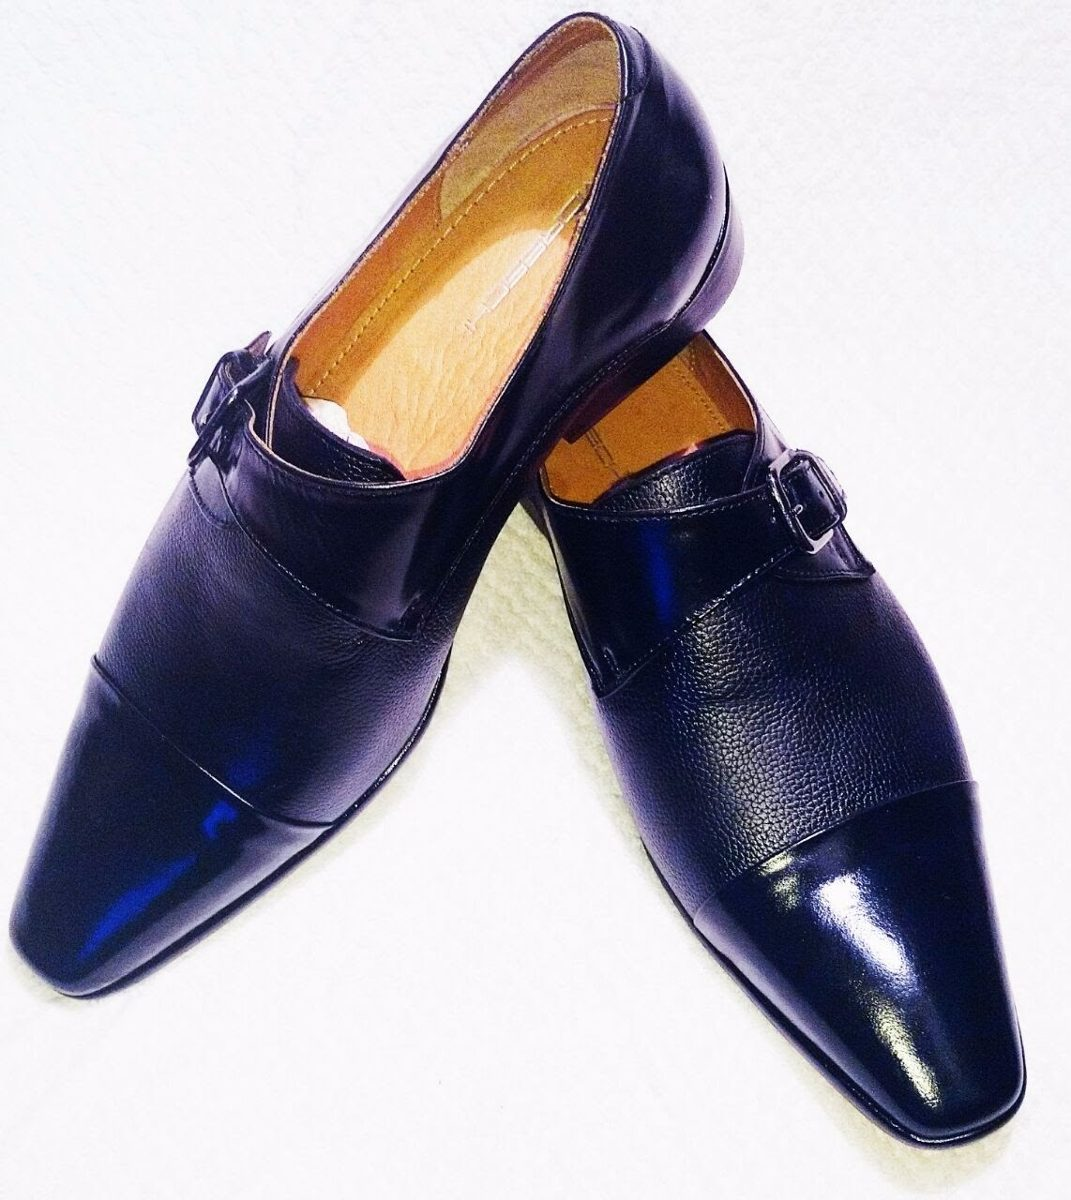 45968daad72 sapato social luxo design italiano promocão couro legitimo. Carregando zoom.